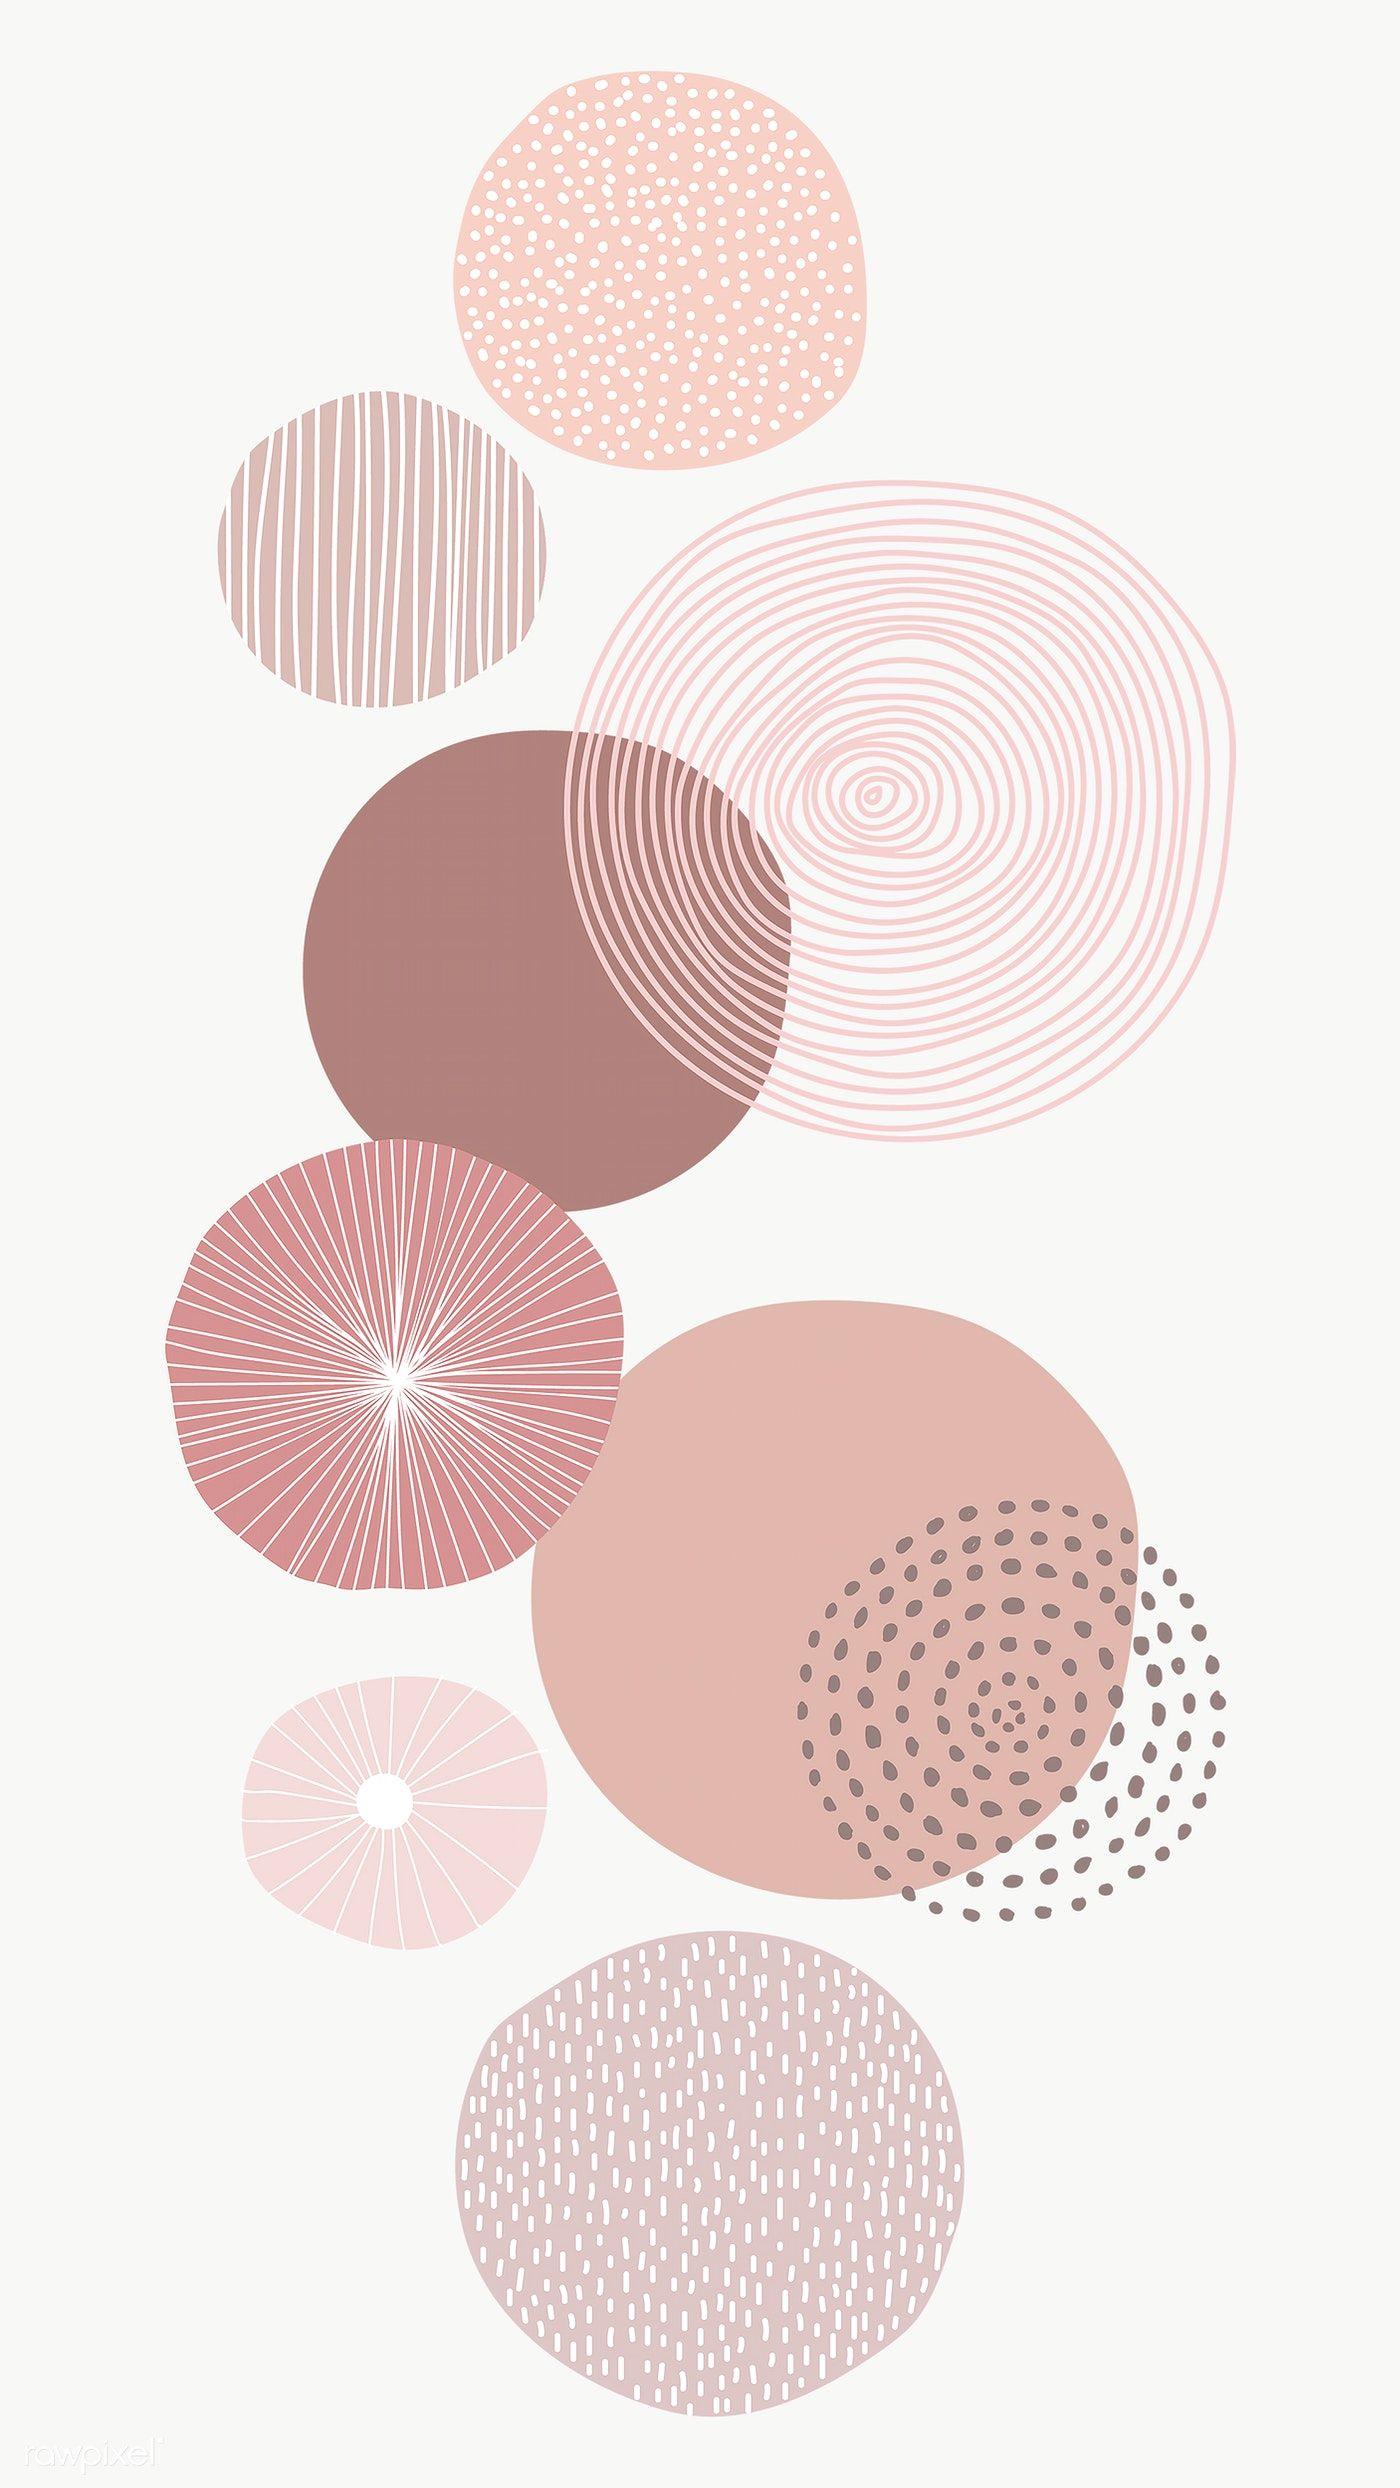 Pastel Pink Round Patterned Print Transparent Png Remix From Original Artwork Premium Geometric Art Prints Iphone Background Wallpaper Minimalist Wallpaper